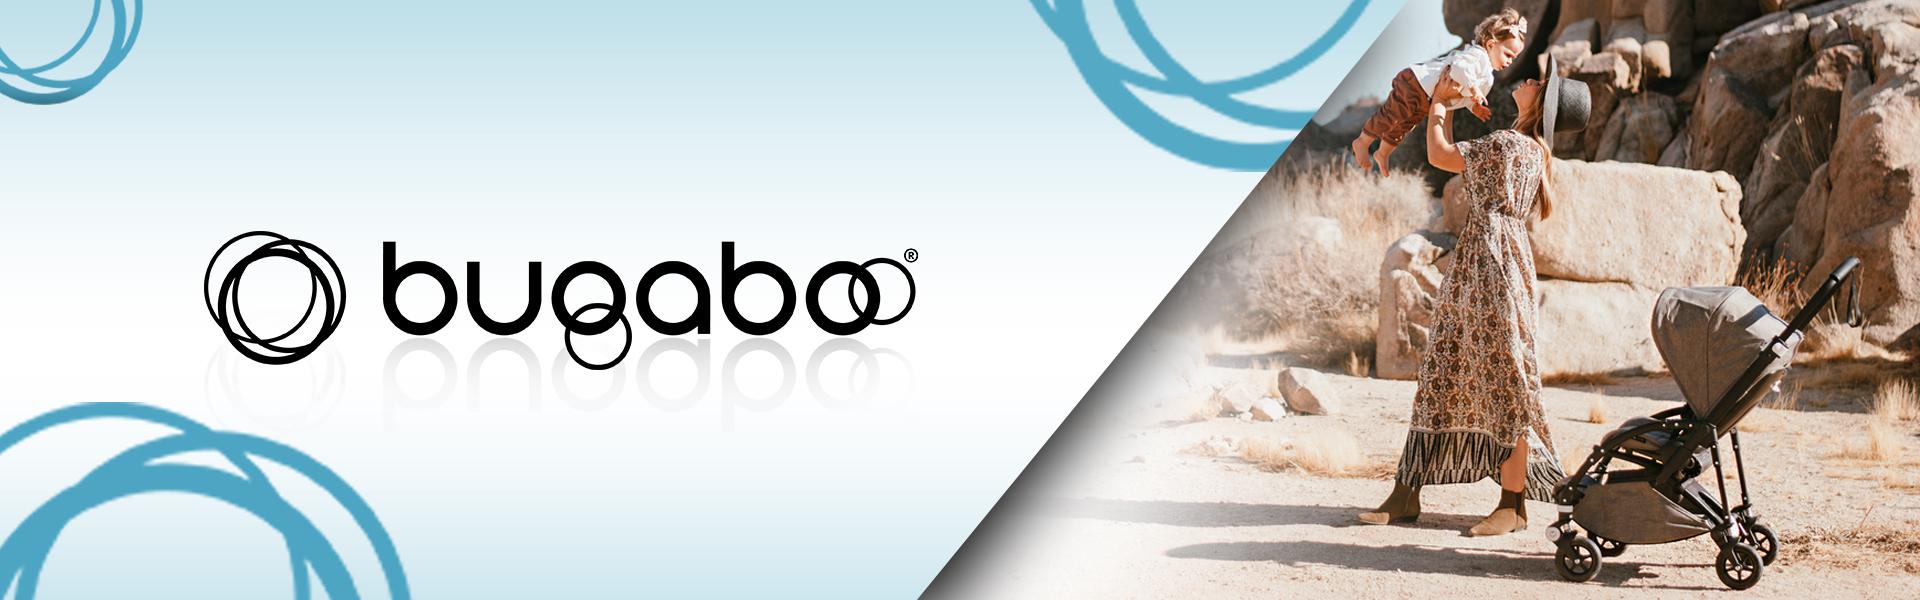 Bugaboo Fox 2 lapsevanker, Black/Black-Black                             Bugaboo